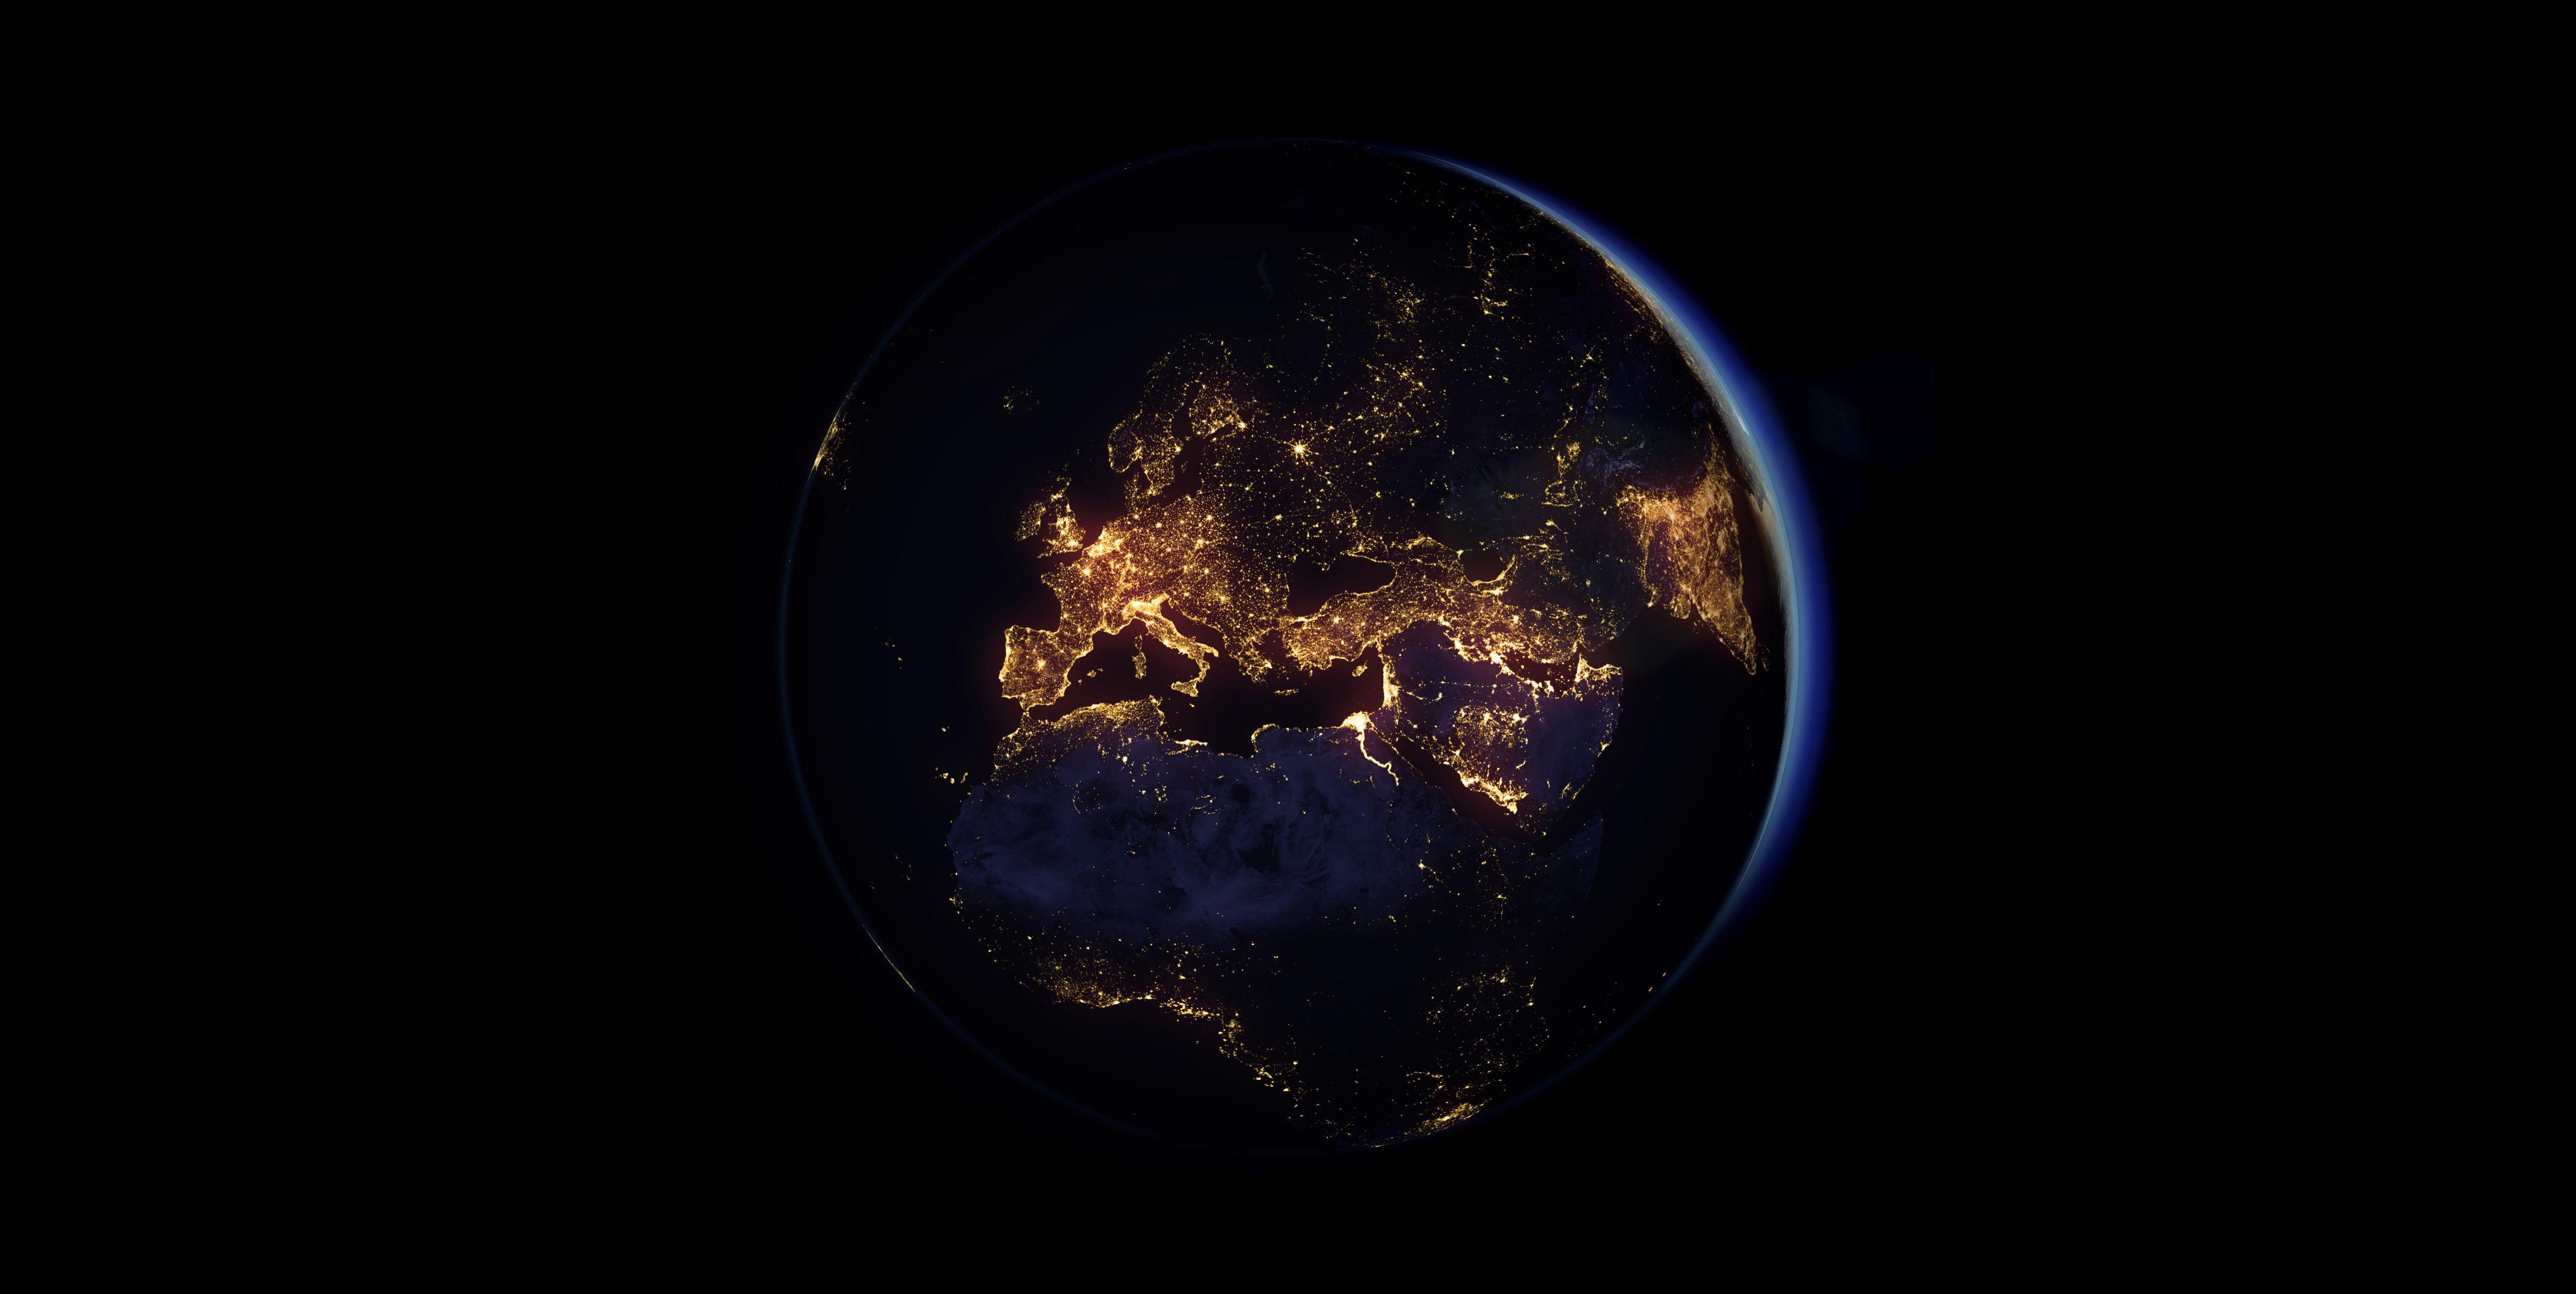 Black Earth Wallpapers - Top Free Black ...